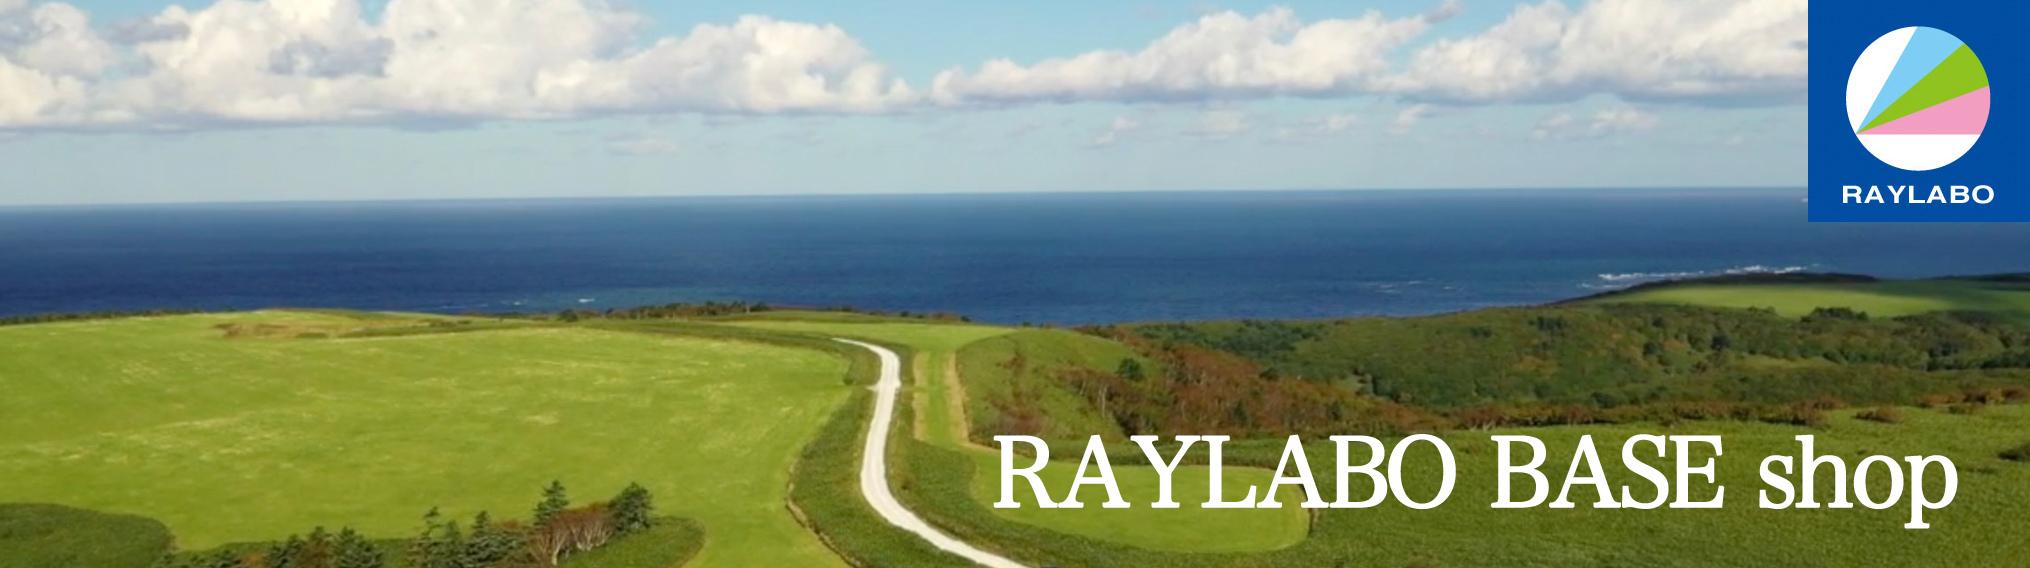 RAYLABO SHOP